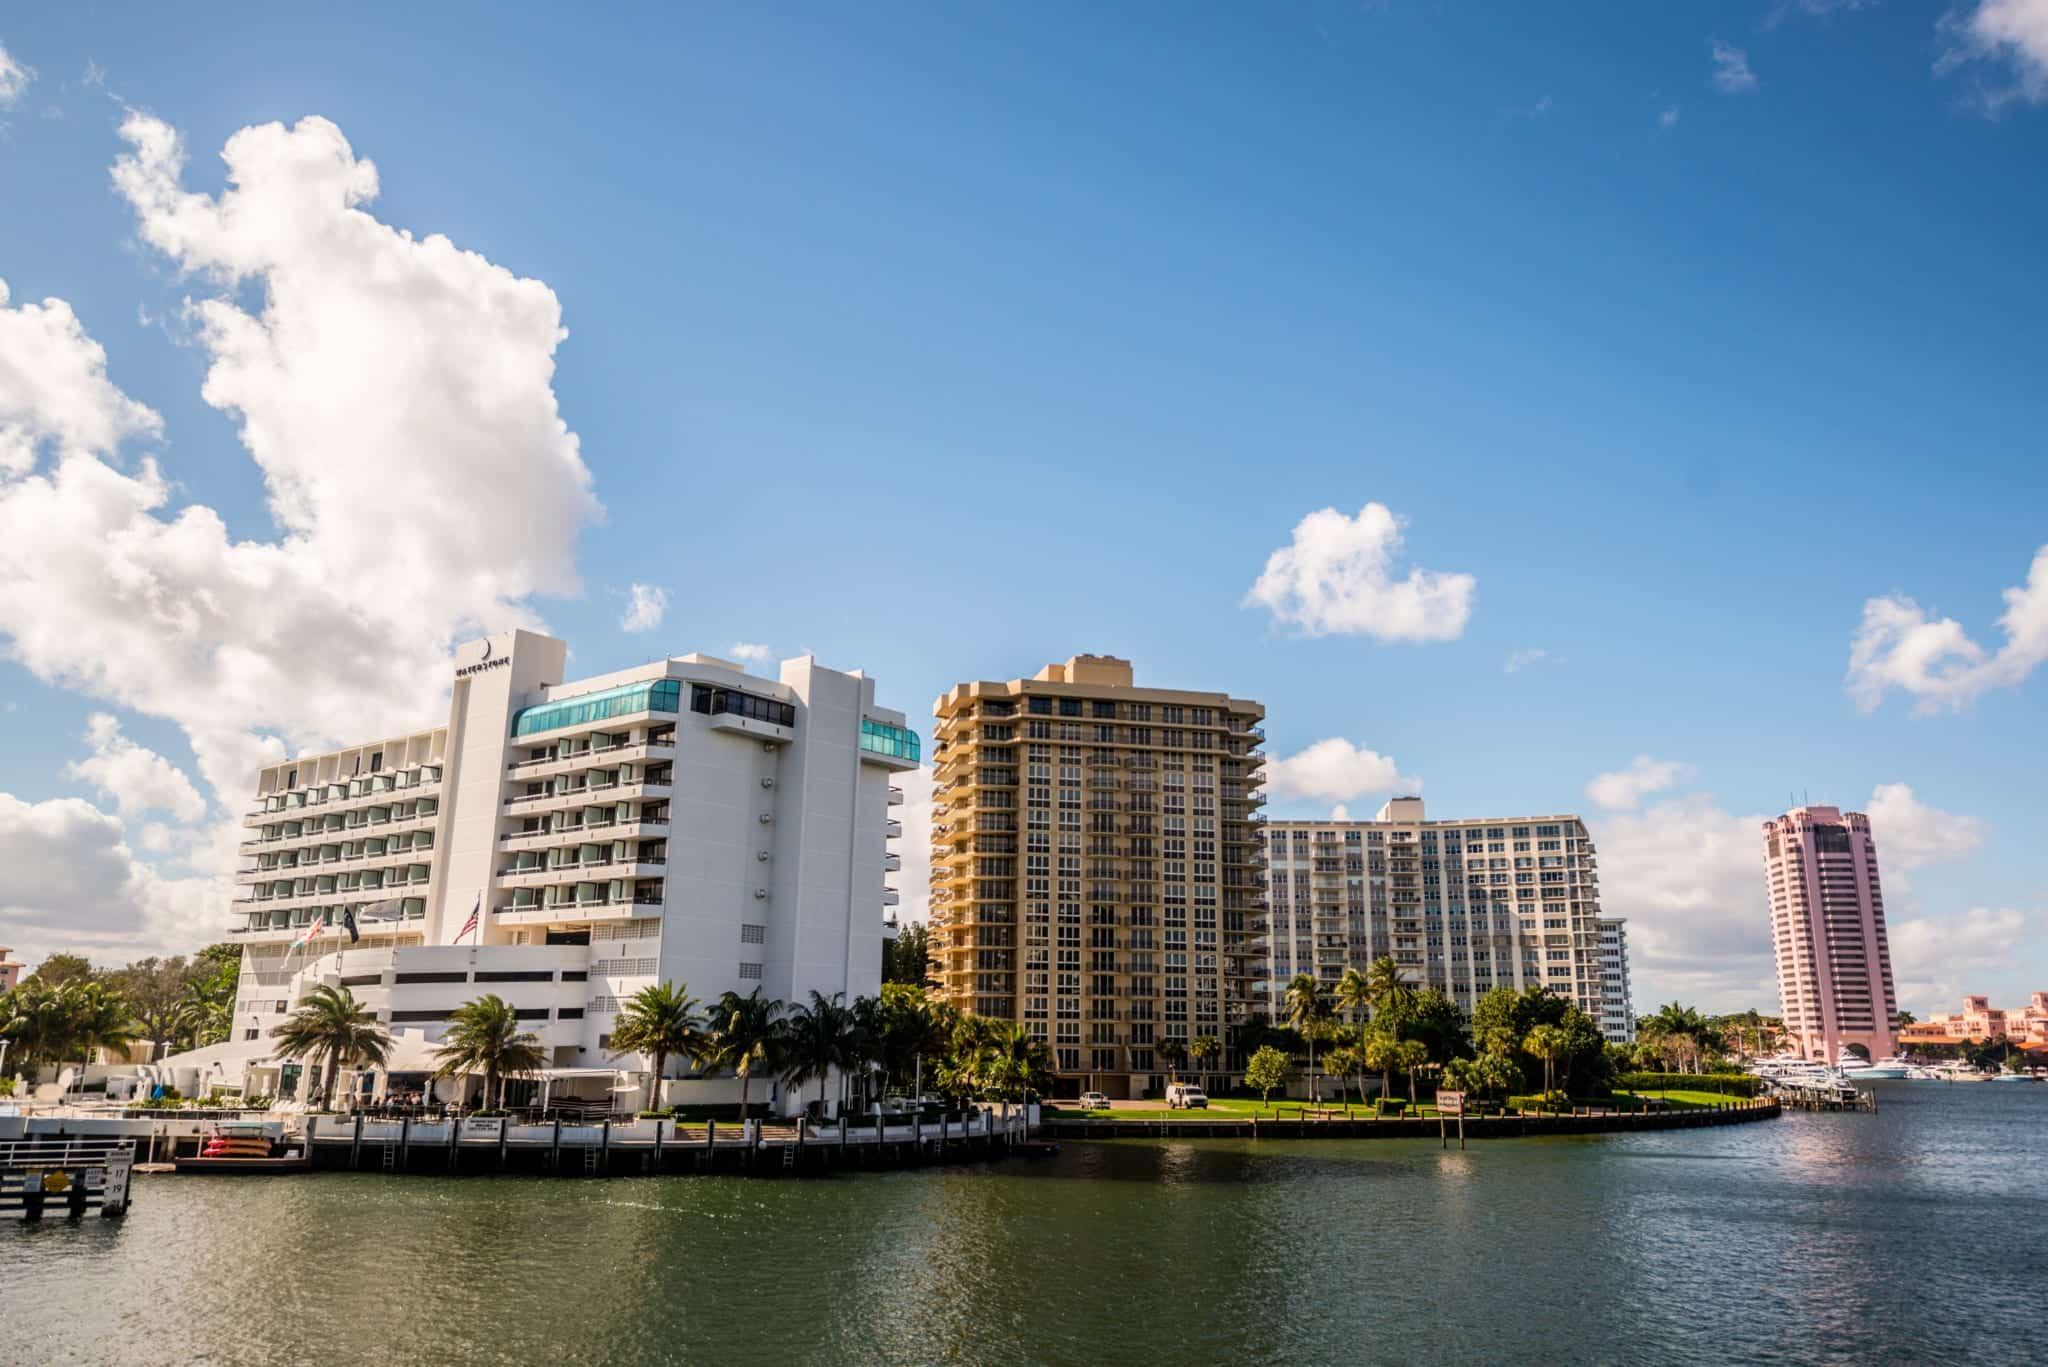 Boca Raton FL Medical Training Facility